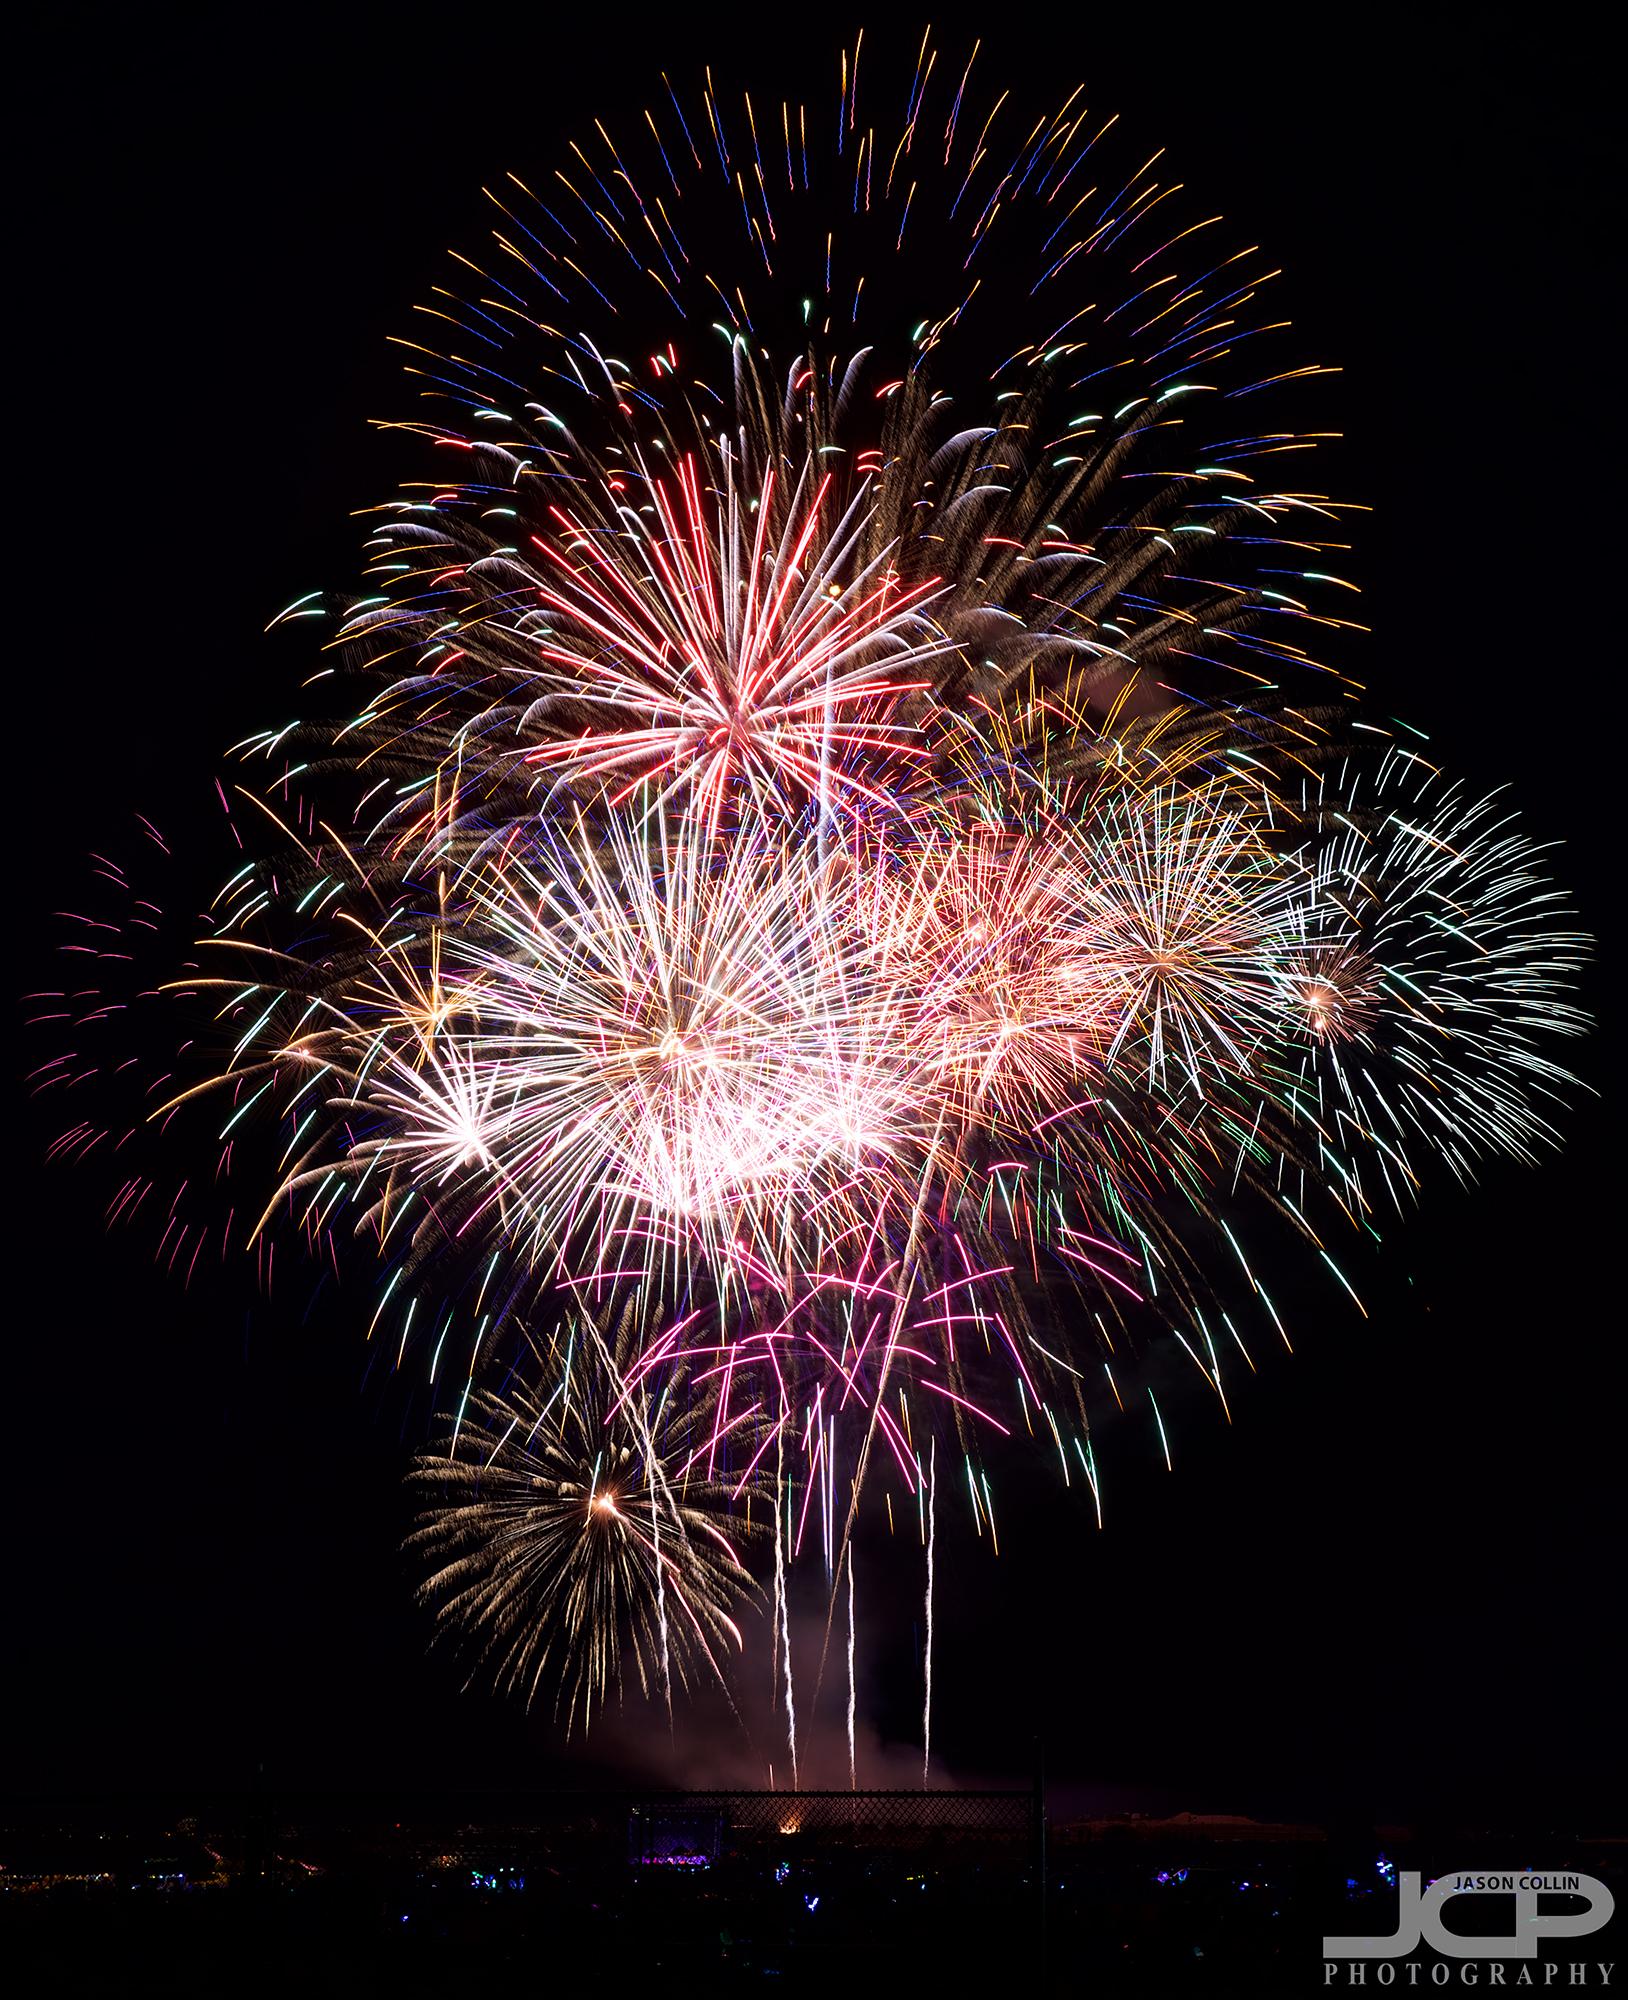 fireworks-7-04-2019-abq-131737.jpg